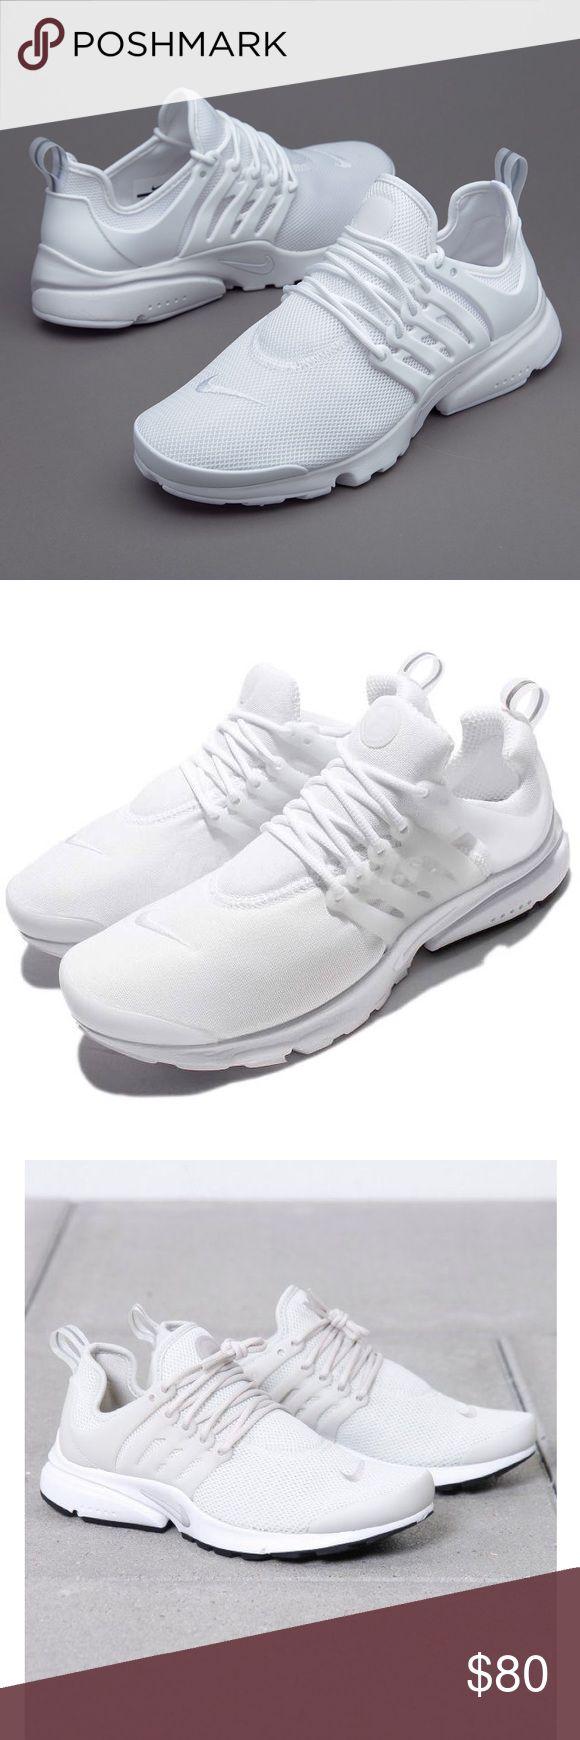 Nike White Presto All white new in box Nike Shoes